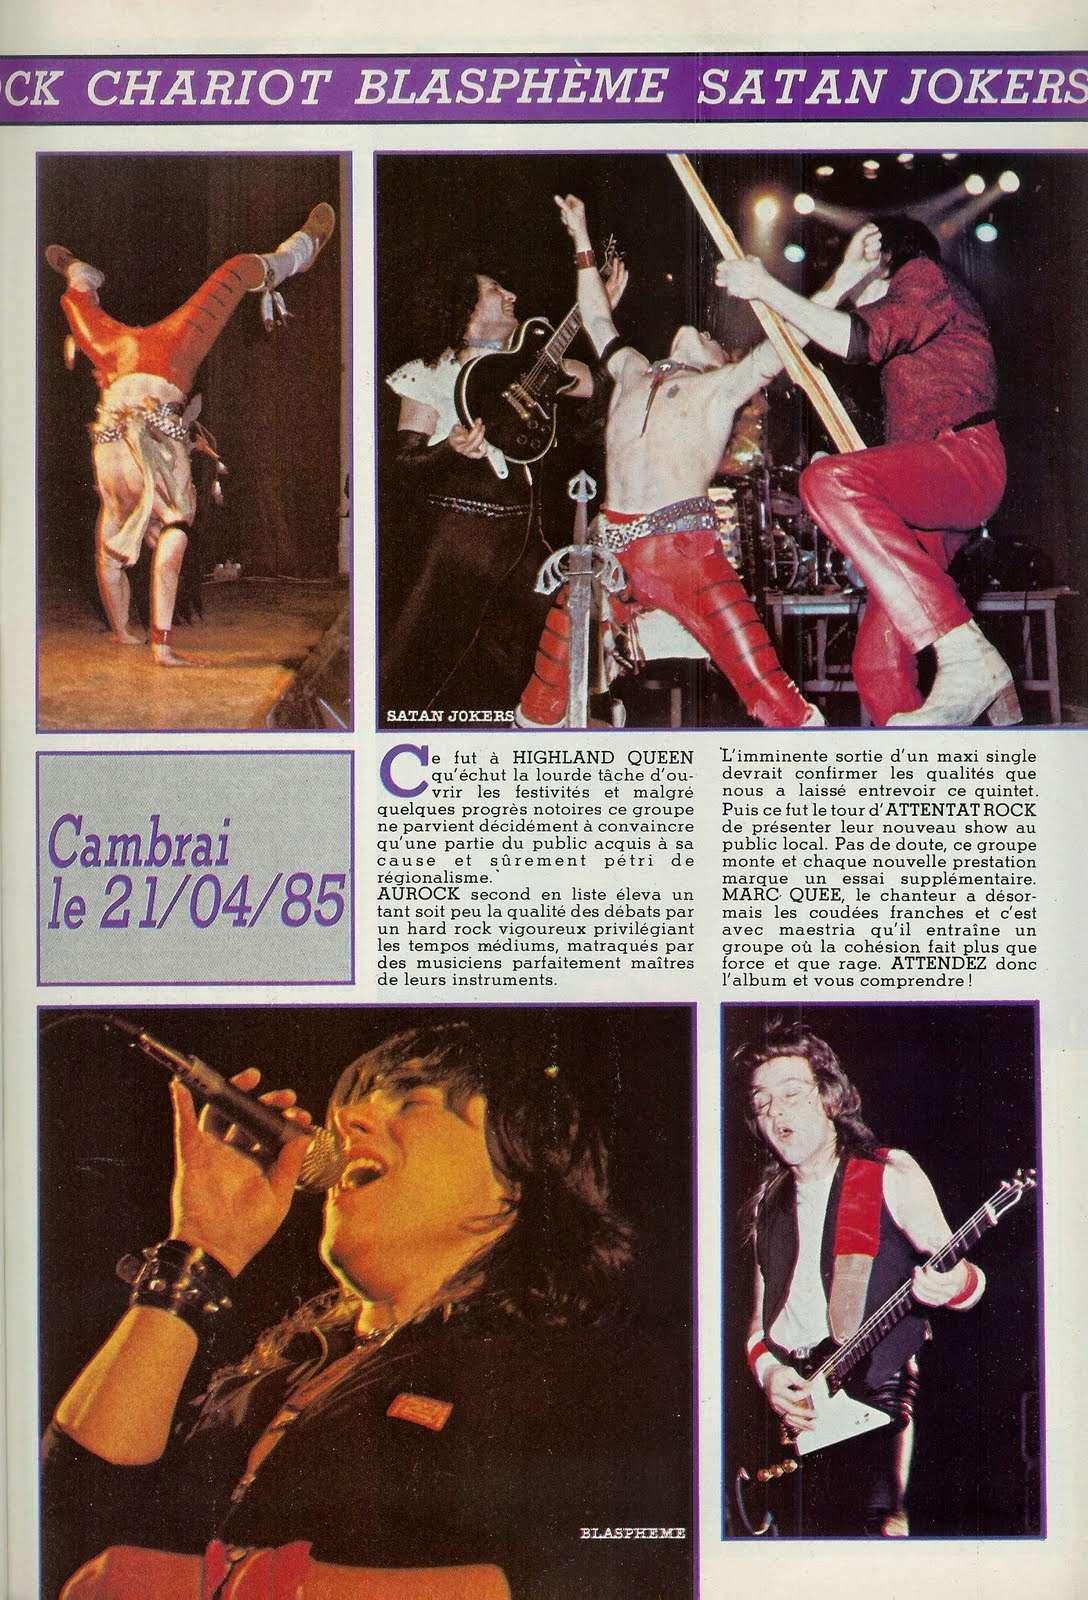 L'Endurock Festival (Cambrai) le 21 avril 1985 Archive Enfer Magazine Juin 1985  Scan0017